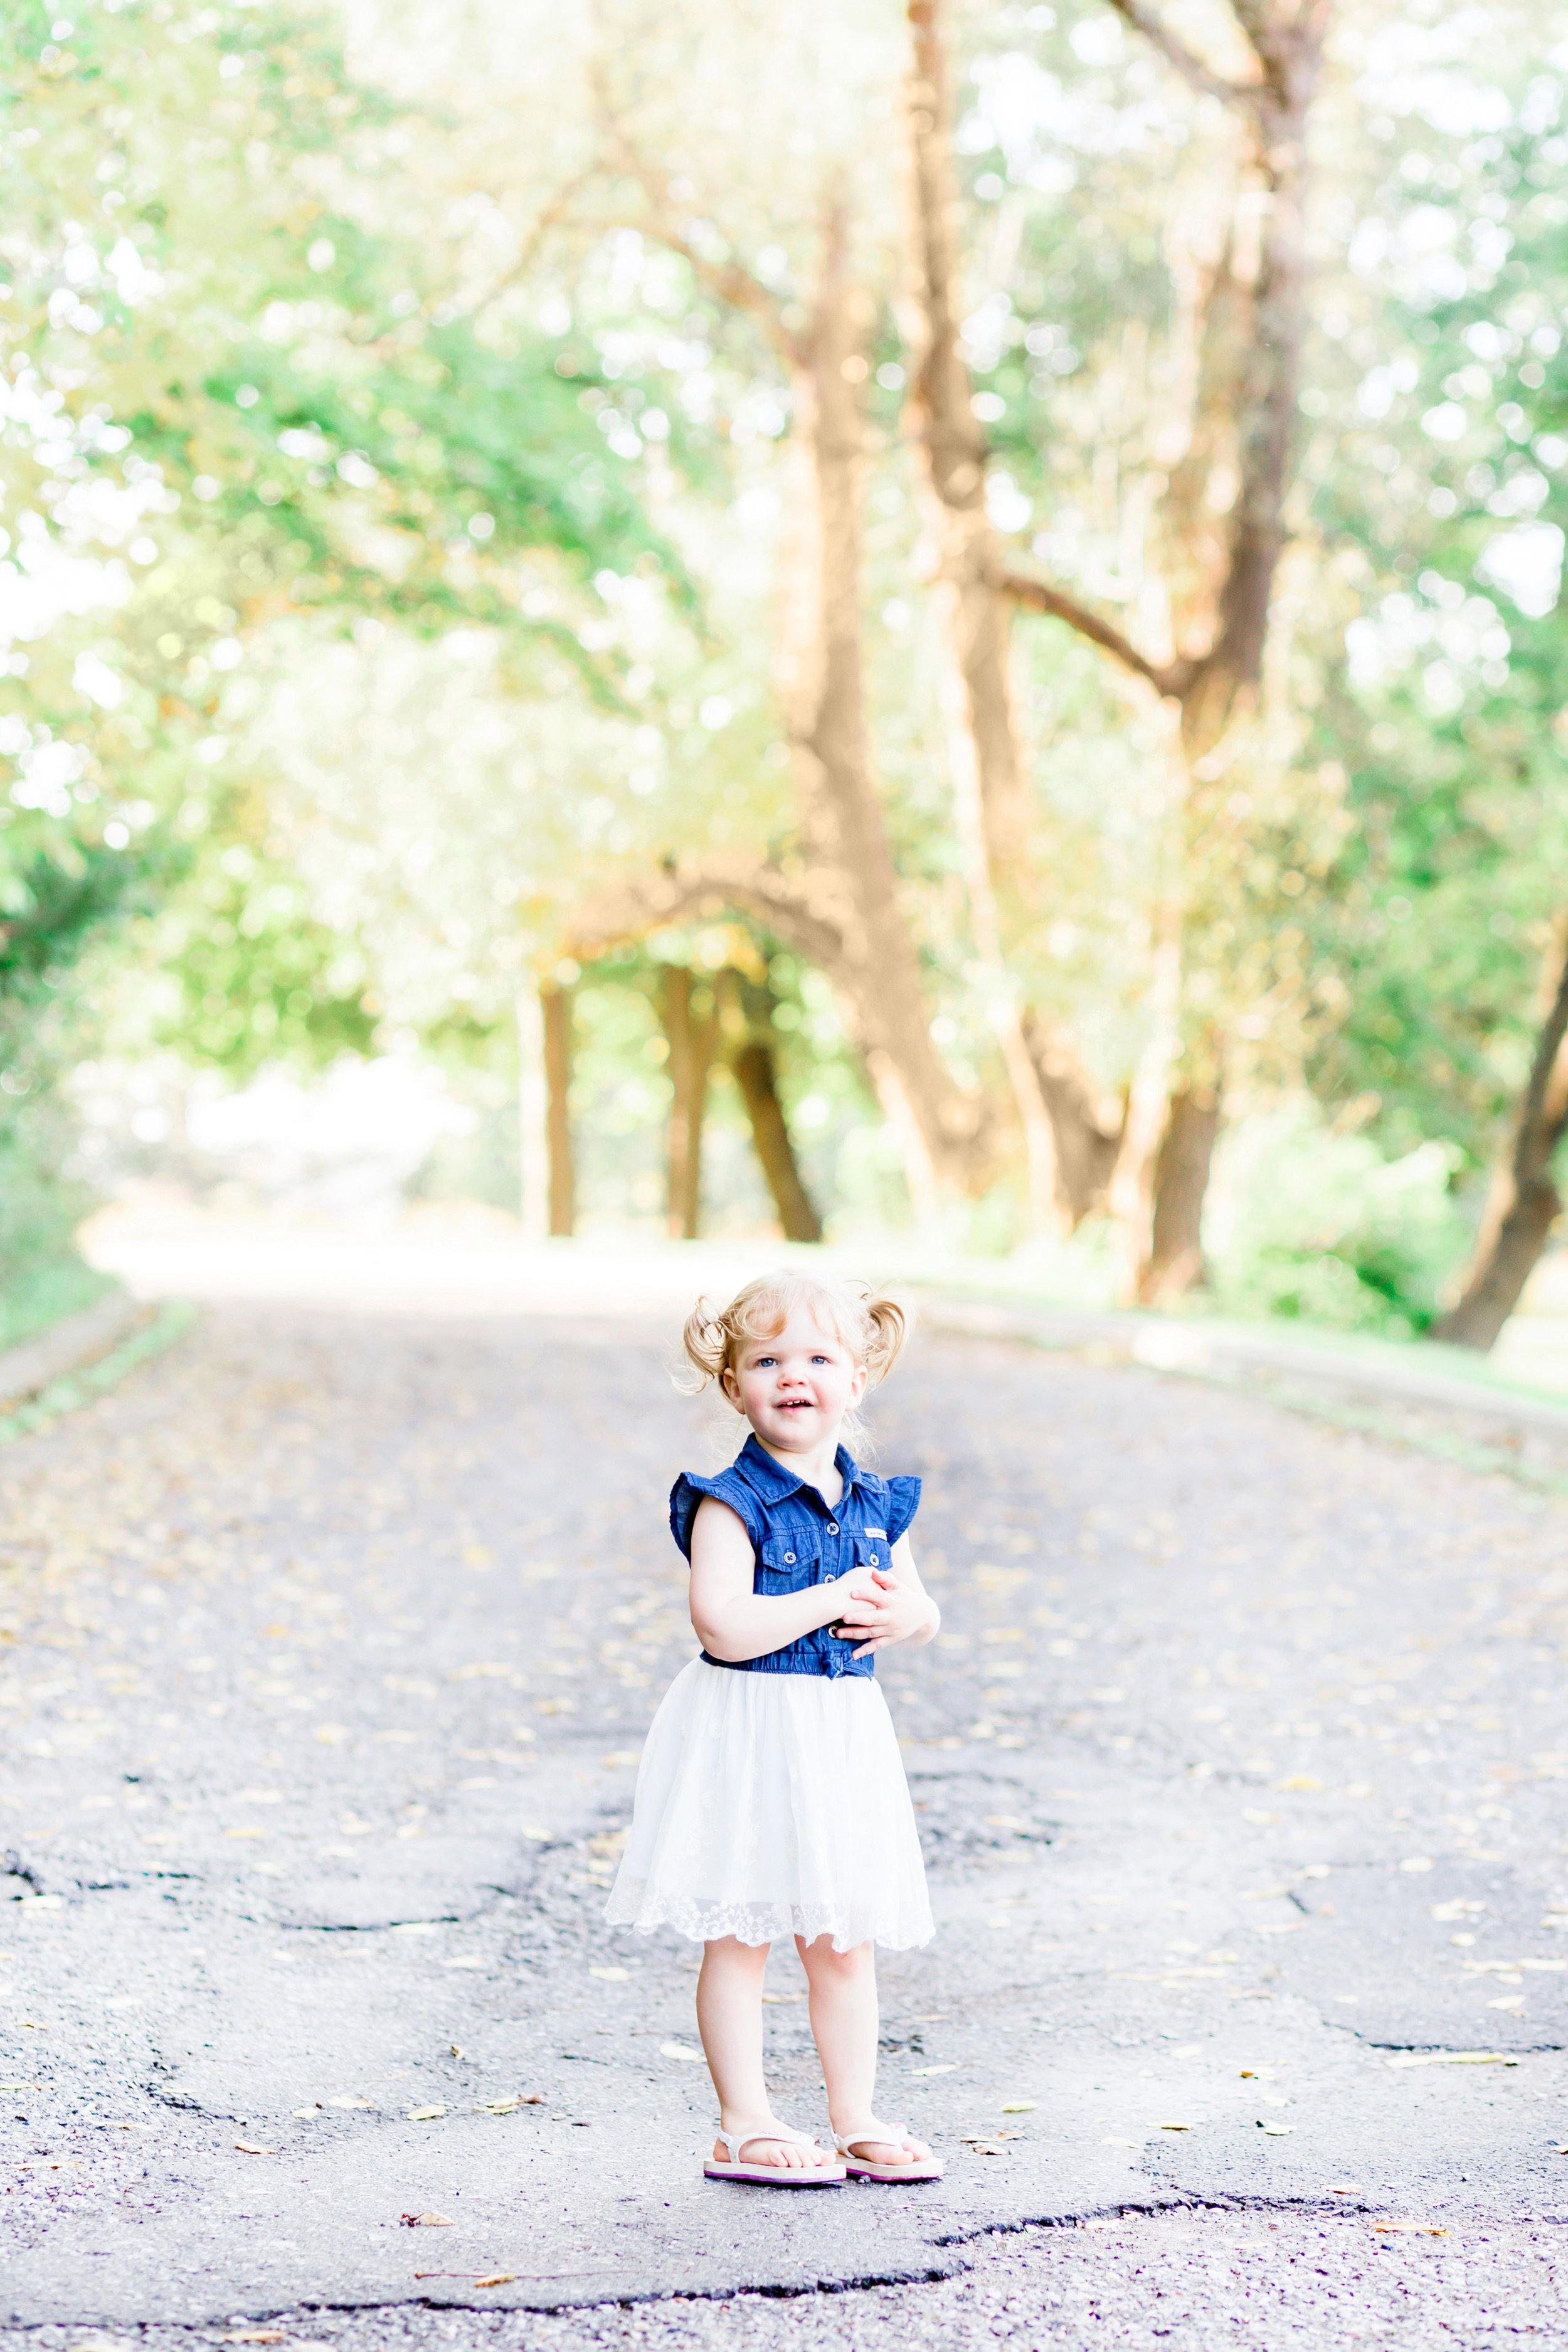 MINISESSIONS-ALEXANDRADELBELLOPHOTOGRAPHY-FAMILYSESSIONHAMILTON.jpg